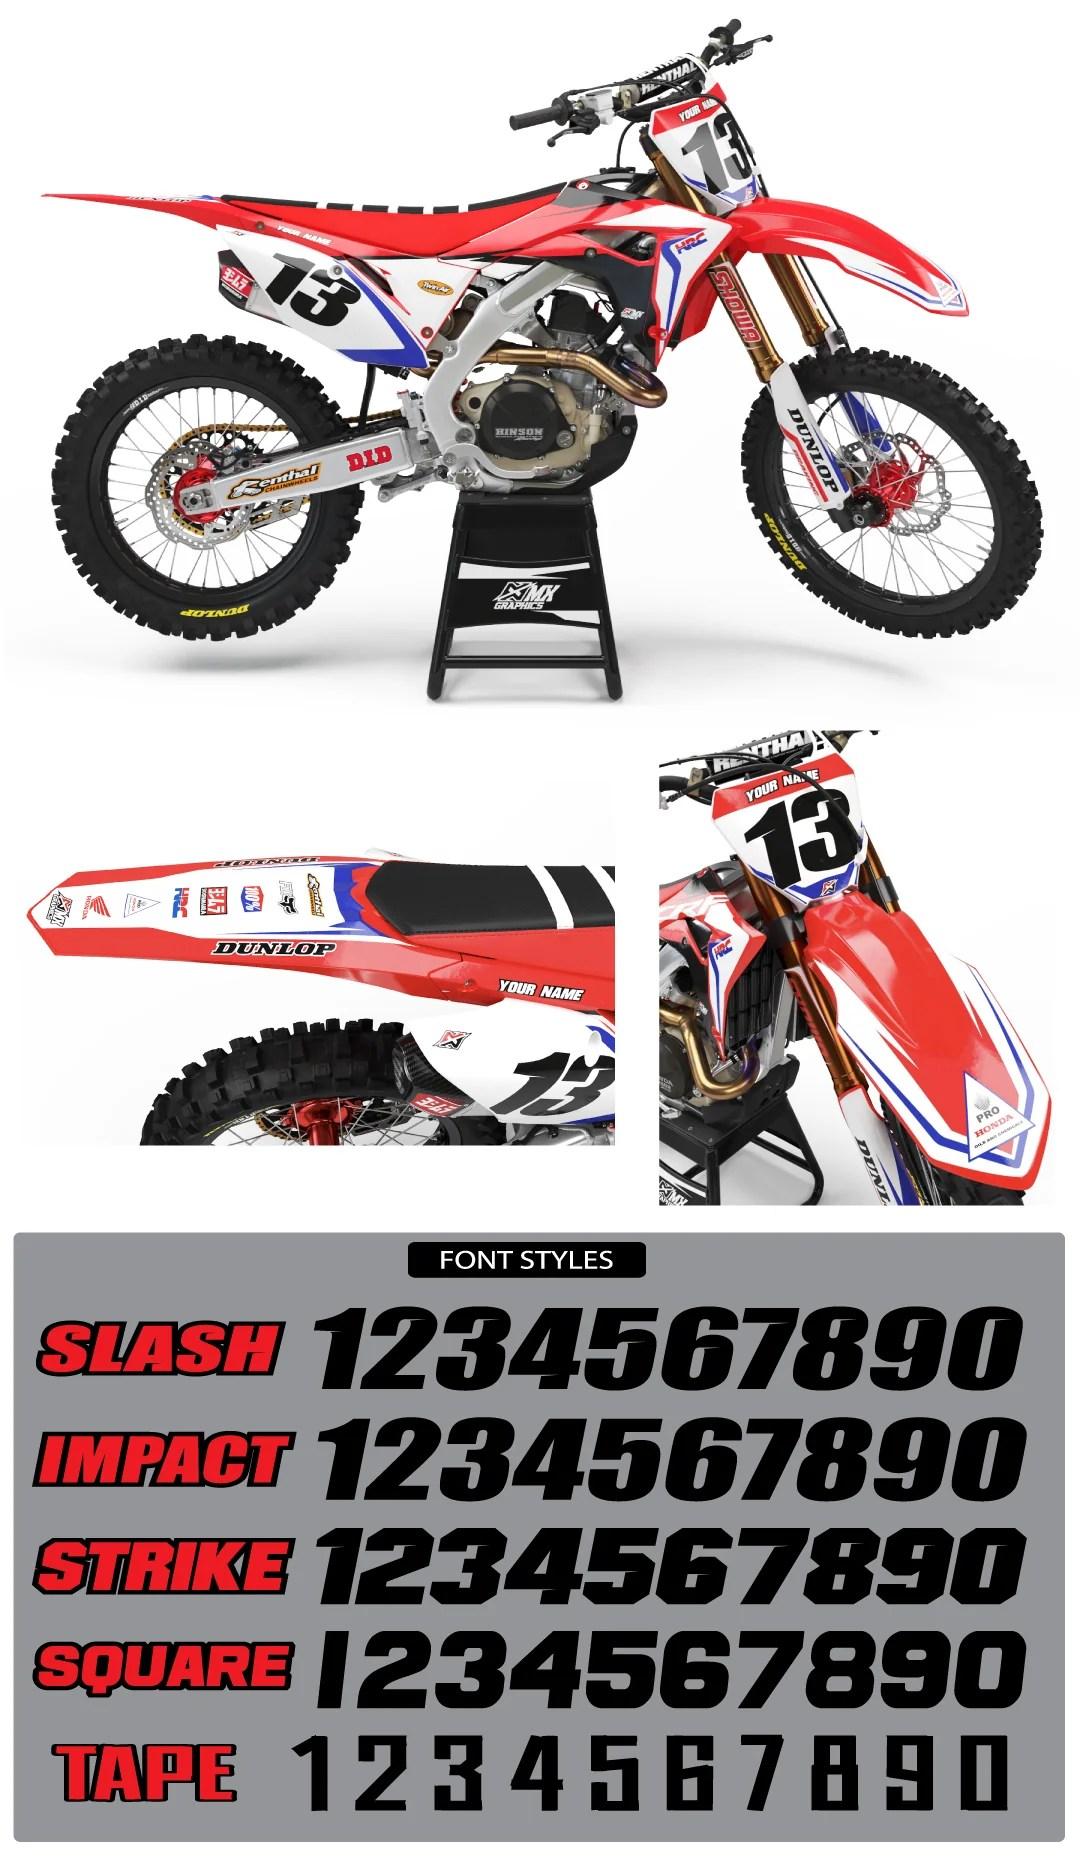 Cr85 Graphics : graphics, Series, Graphic, Honda's, Graphics